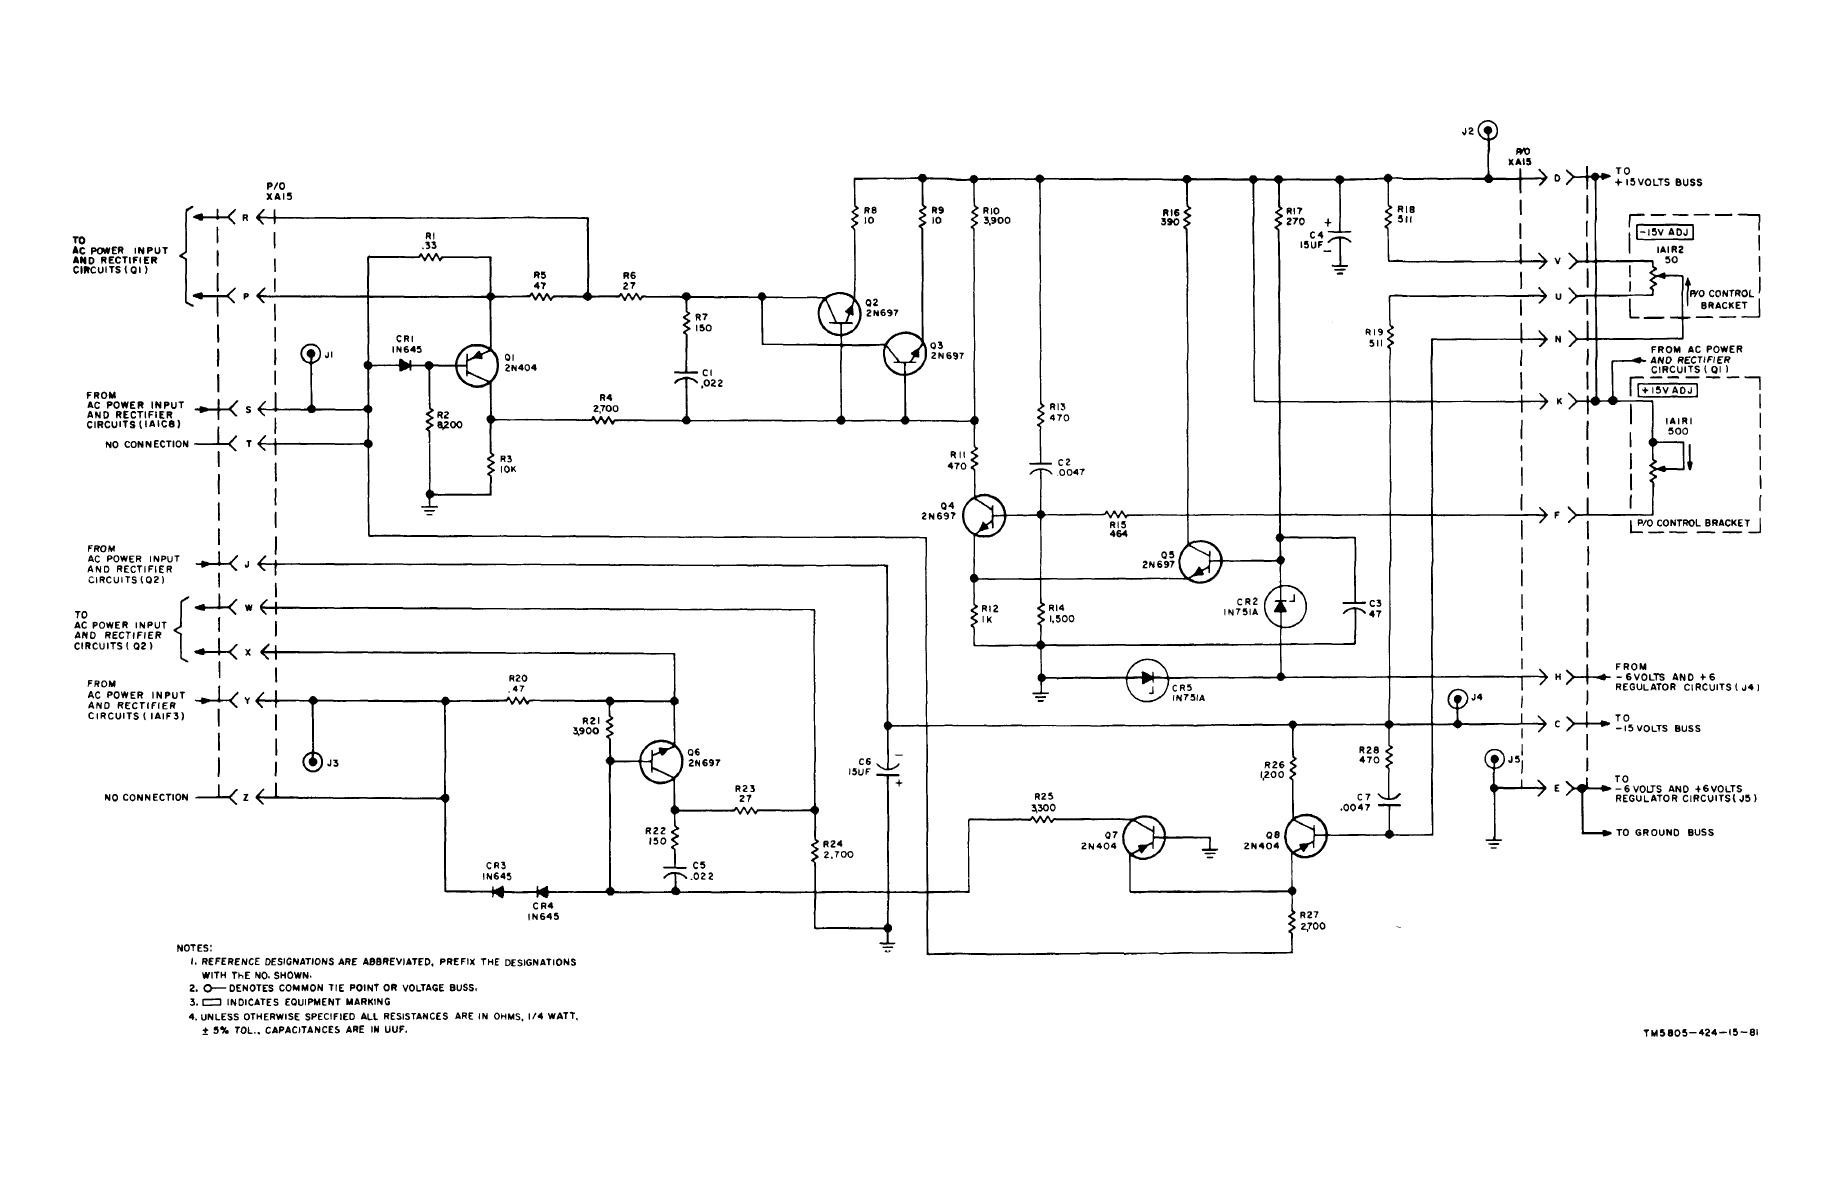 Wiring Diagram for Xbox 360 Power Supply Refrence Power Mander 3 Wiring Diagram Kuwaitigenius